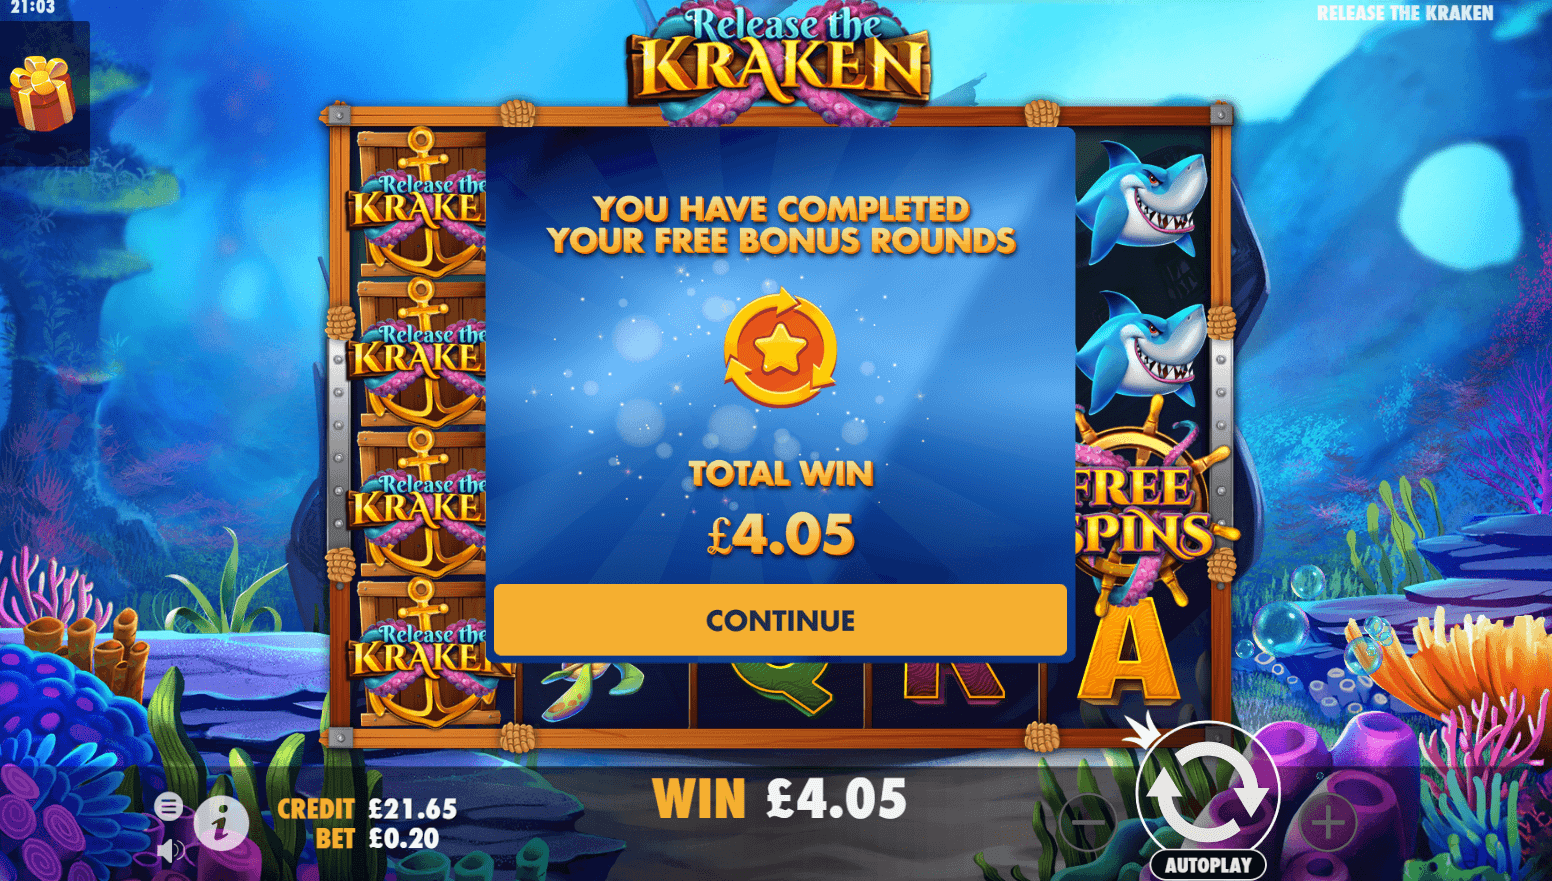 Reels Room - Release the Kraken bonus round